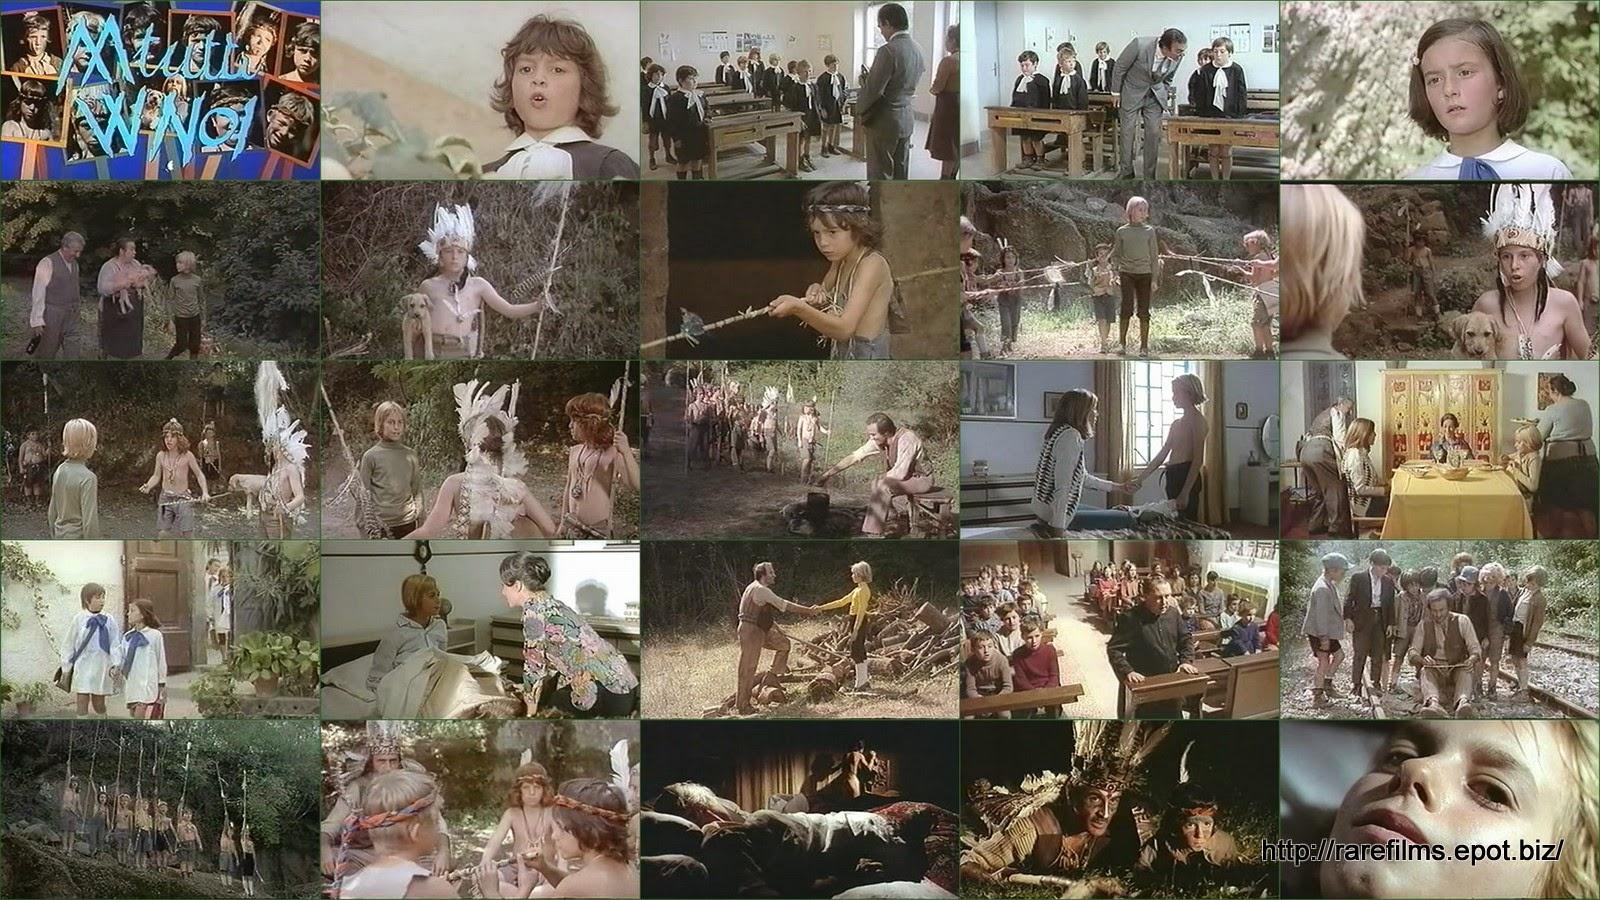 Мы лучше всех / Abbasso Tutti, Viva Noi / Three Cheers For Us. 1974.